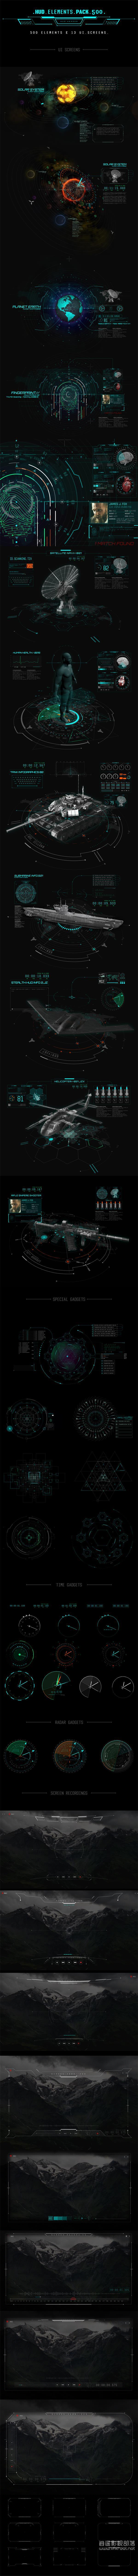 O1CN01QNeVfB1kQZKD10Sa6_!!1075754678 AE模板:500组+未来高科技游戏军事战争UI界面坦克飞机雷达模型动画元素